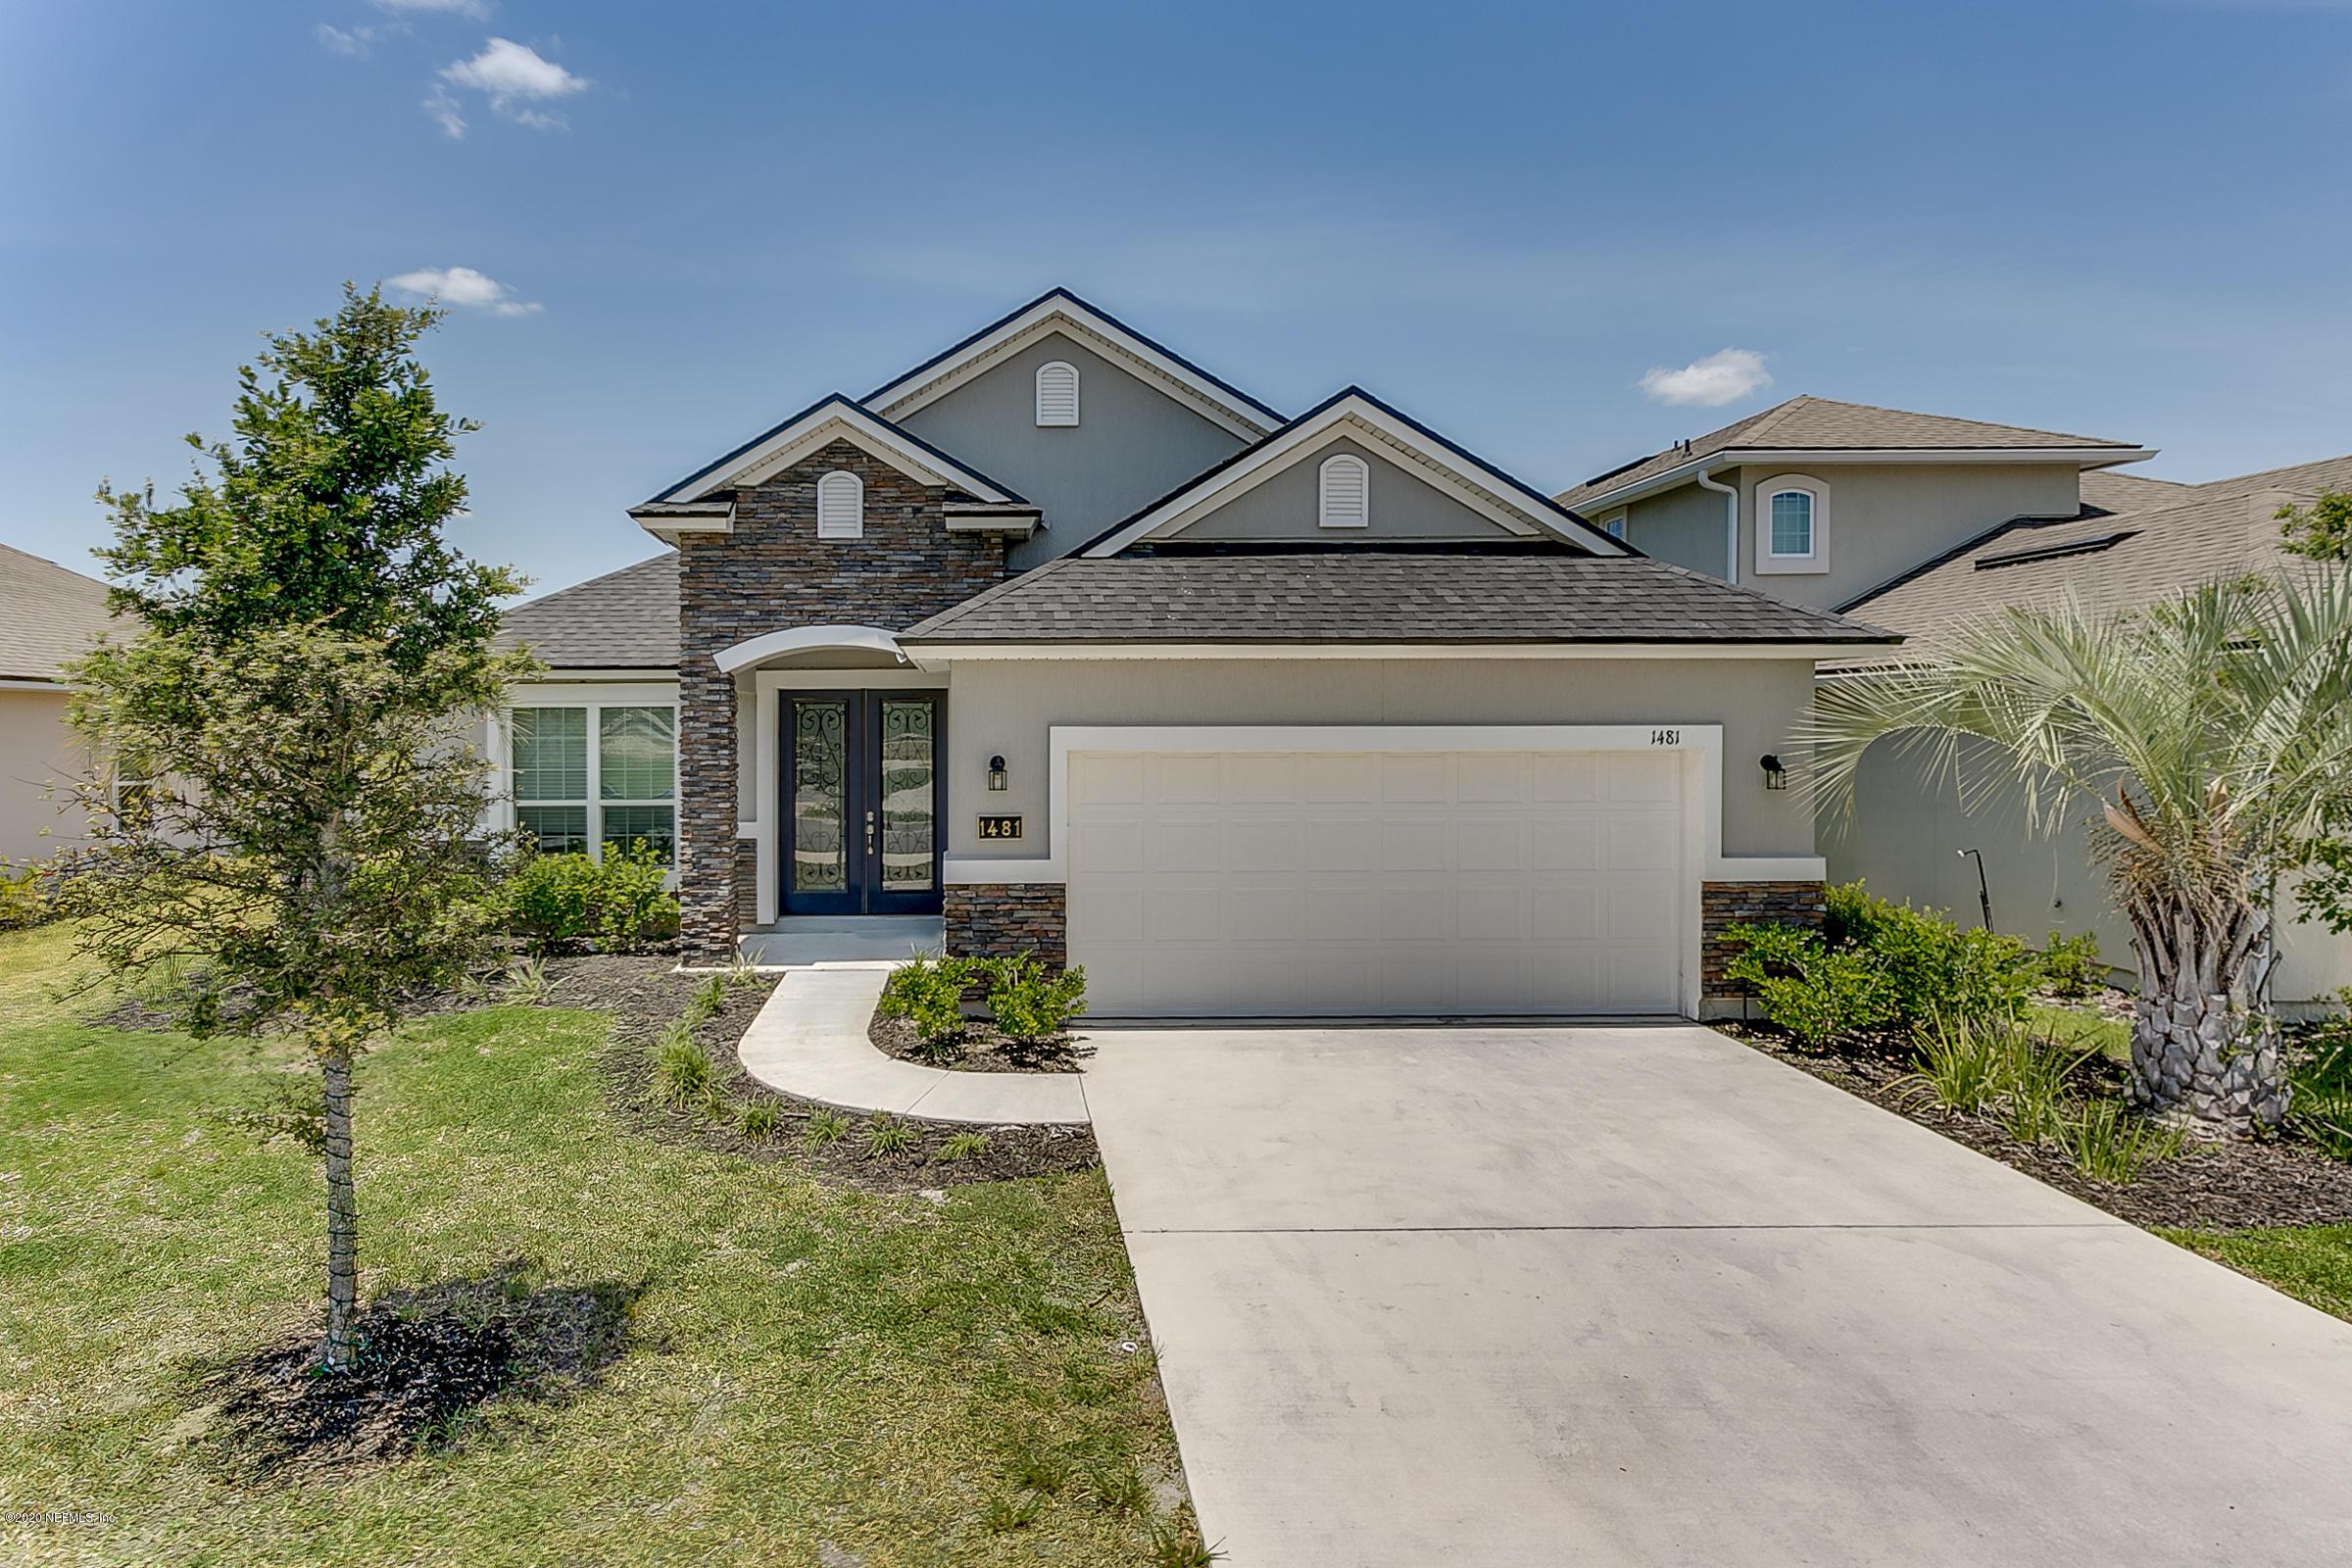 1481 AUTUMN PINES, ORANGE PARK, FLORIDA 32065, 4 Bedrooms Bedrooms, ,3 BathroomsBathrooms,Residential,For sale,AUTUMN PINES,1054921